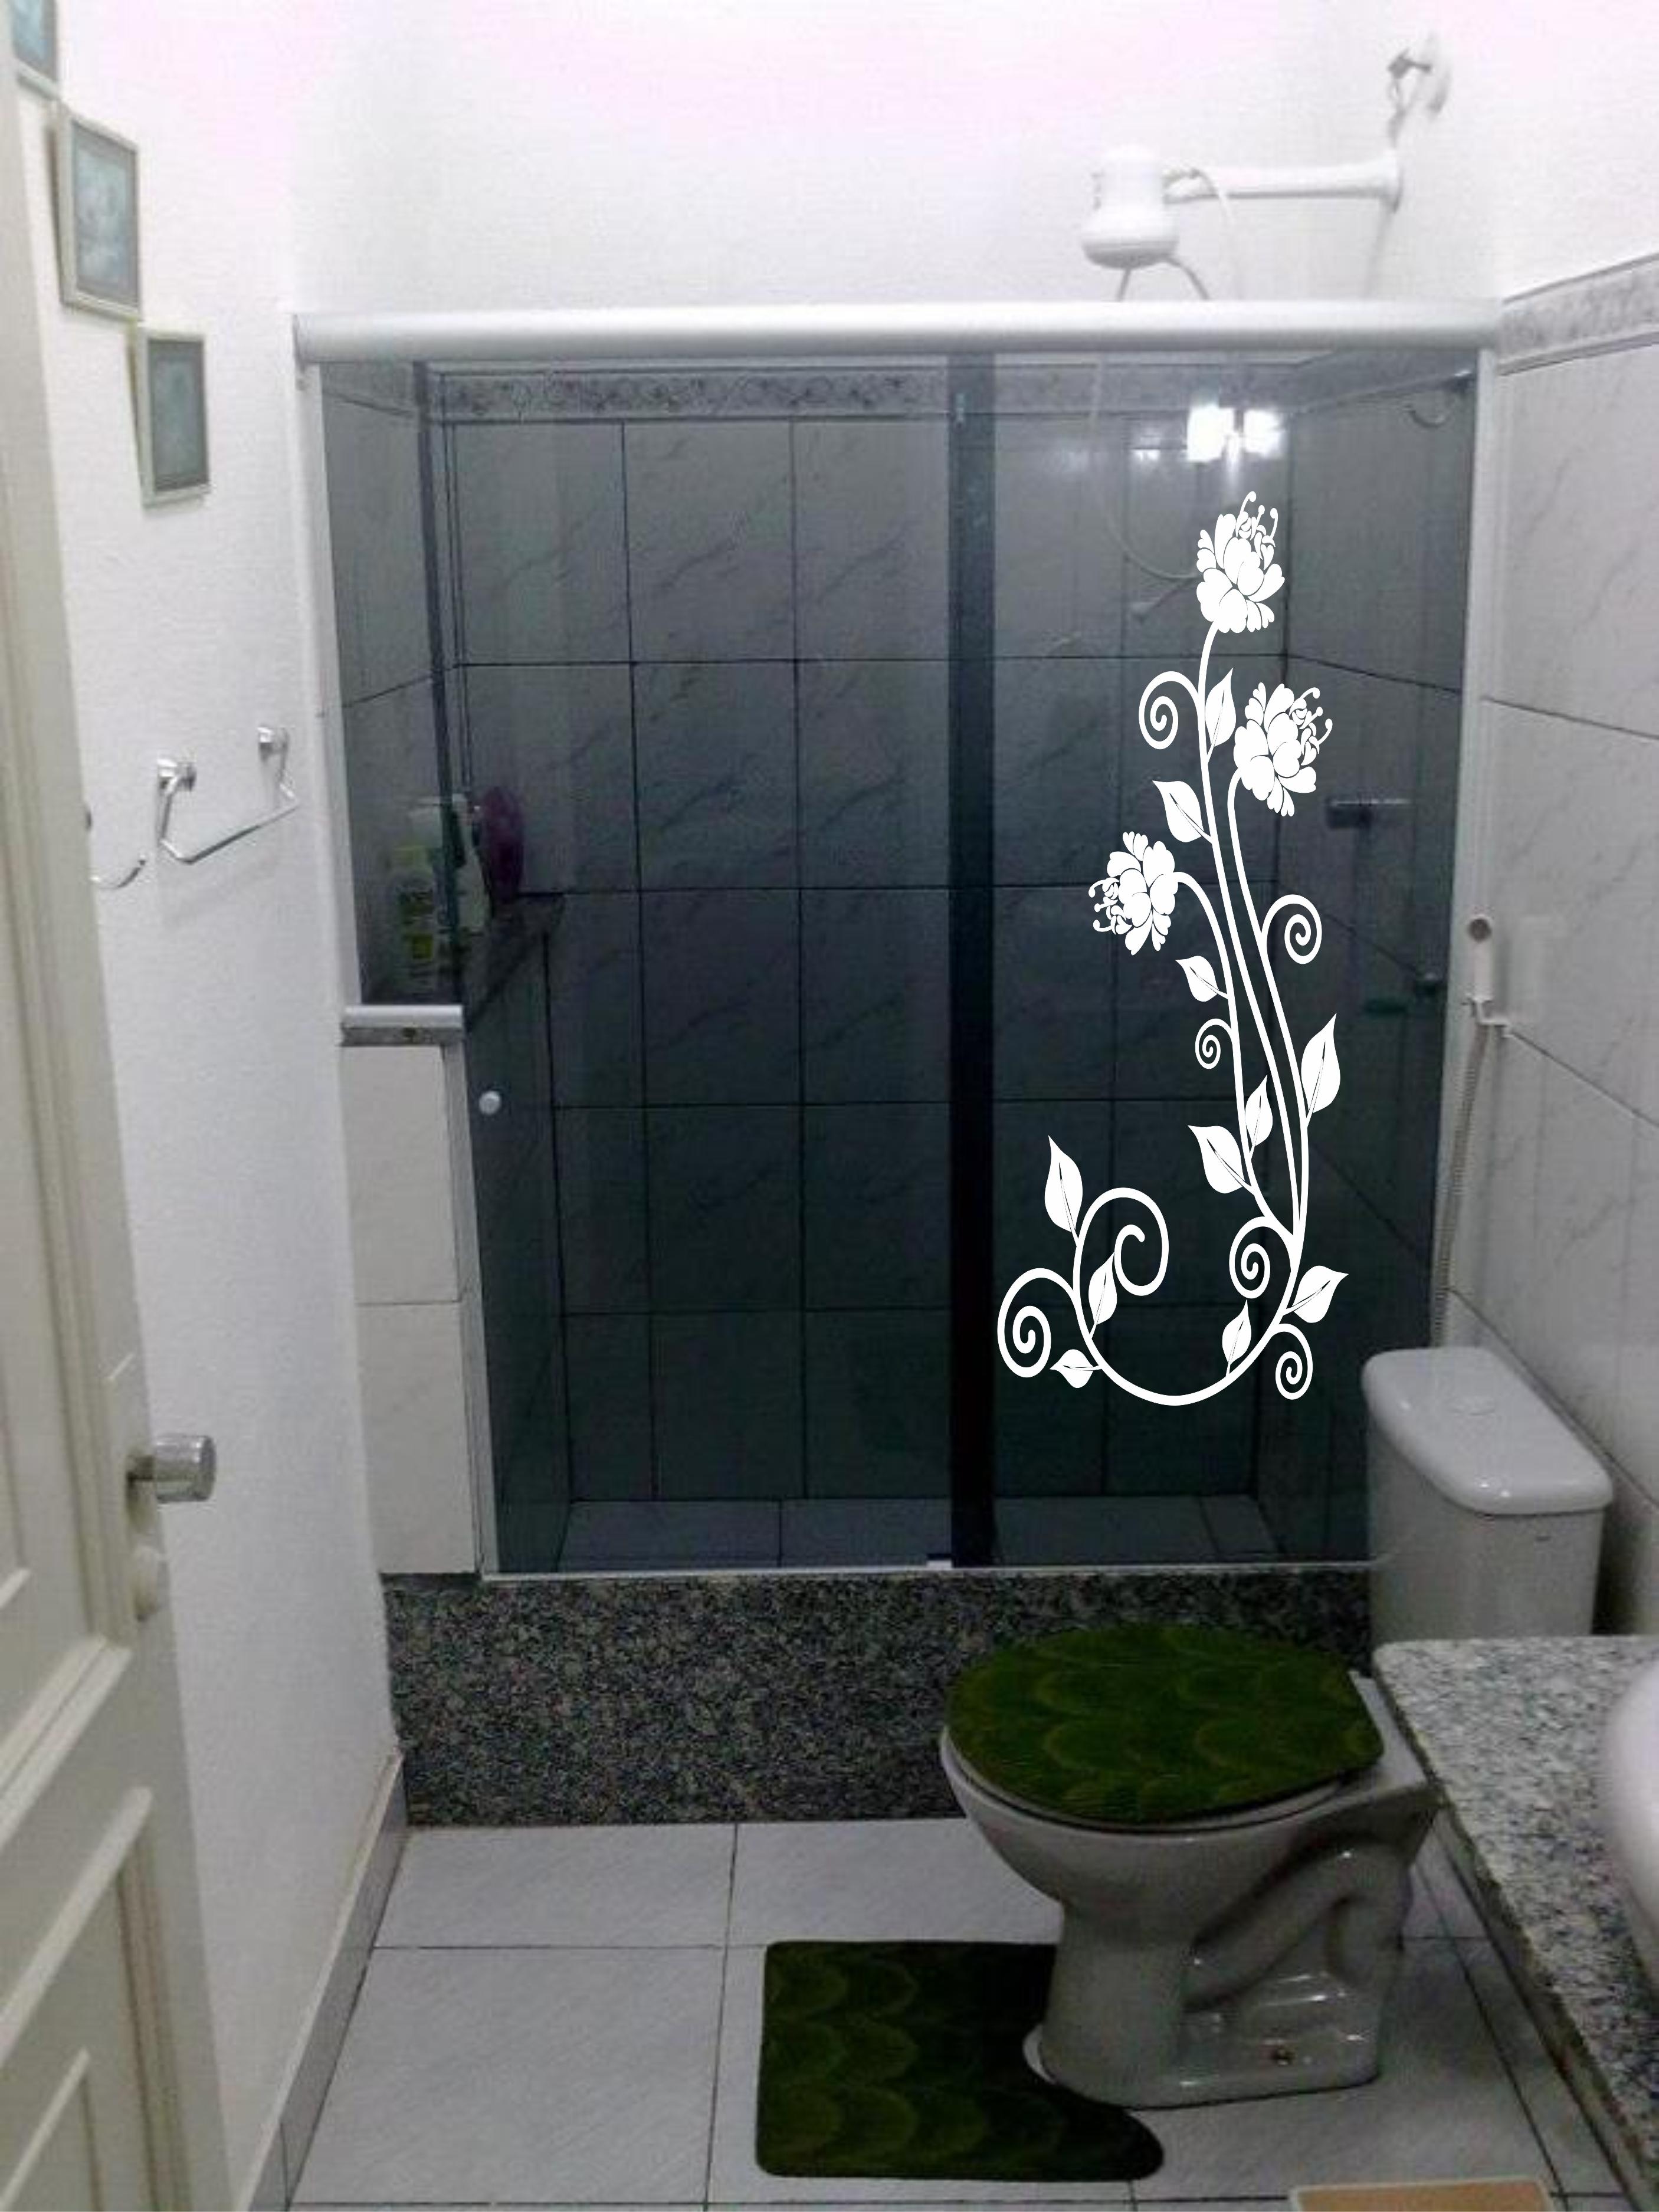 Imagens de #665C4C Adesivo Box Blindex banheiro Adesivos Sempre Viva Elo7 2812x3750 px 3514 Blindex De Banheiro Rj